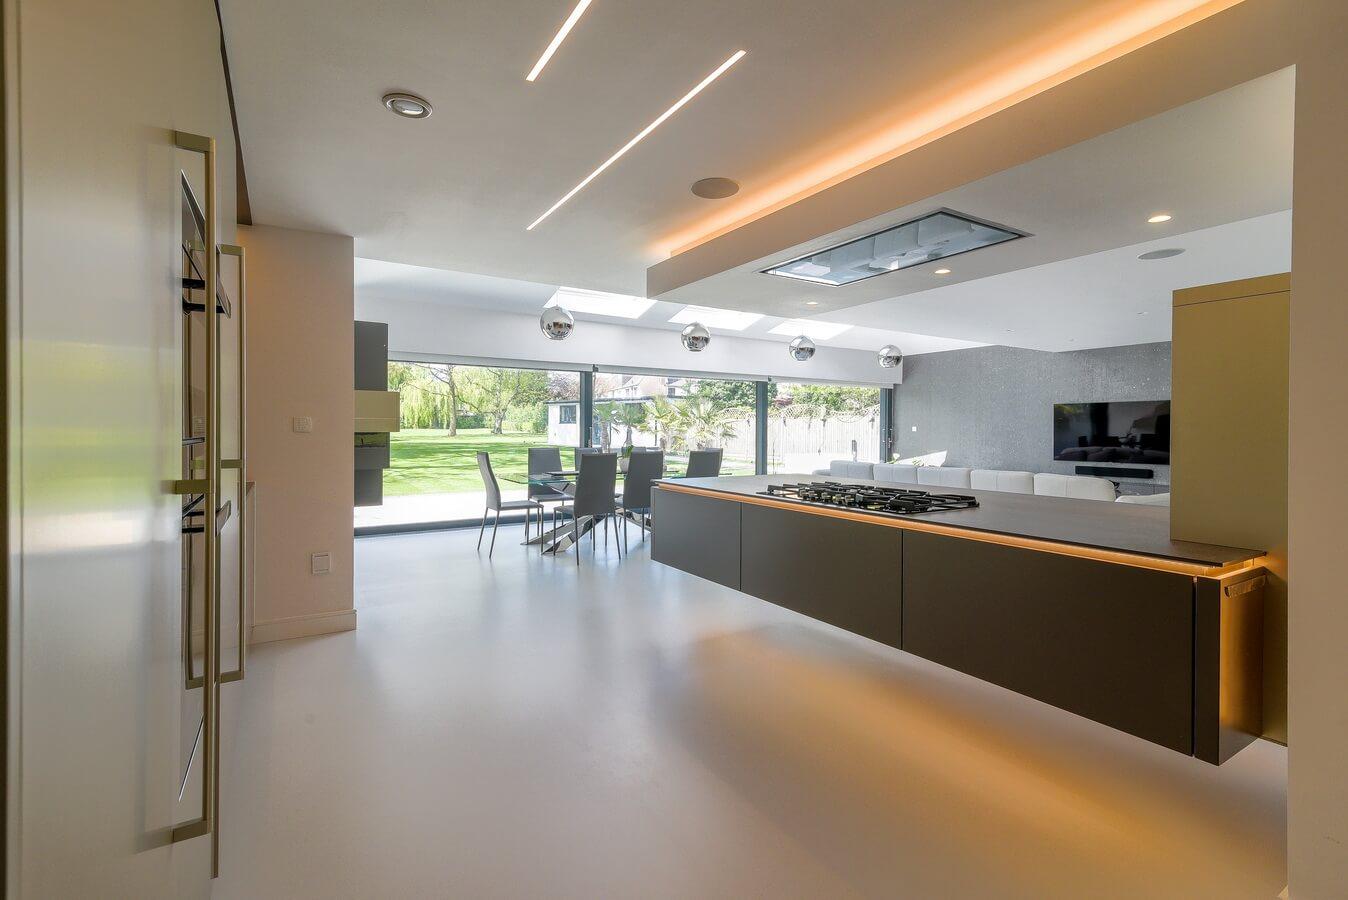 led-lighting-warendorf-kitchen.jpg